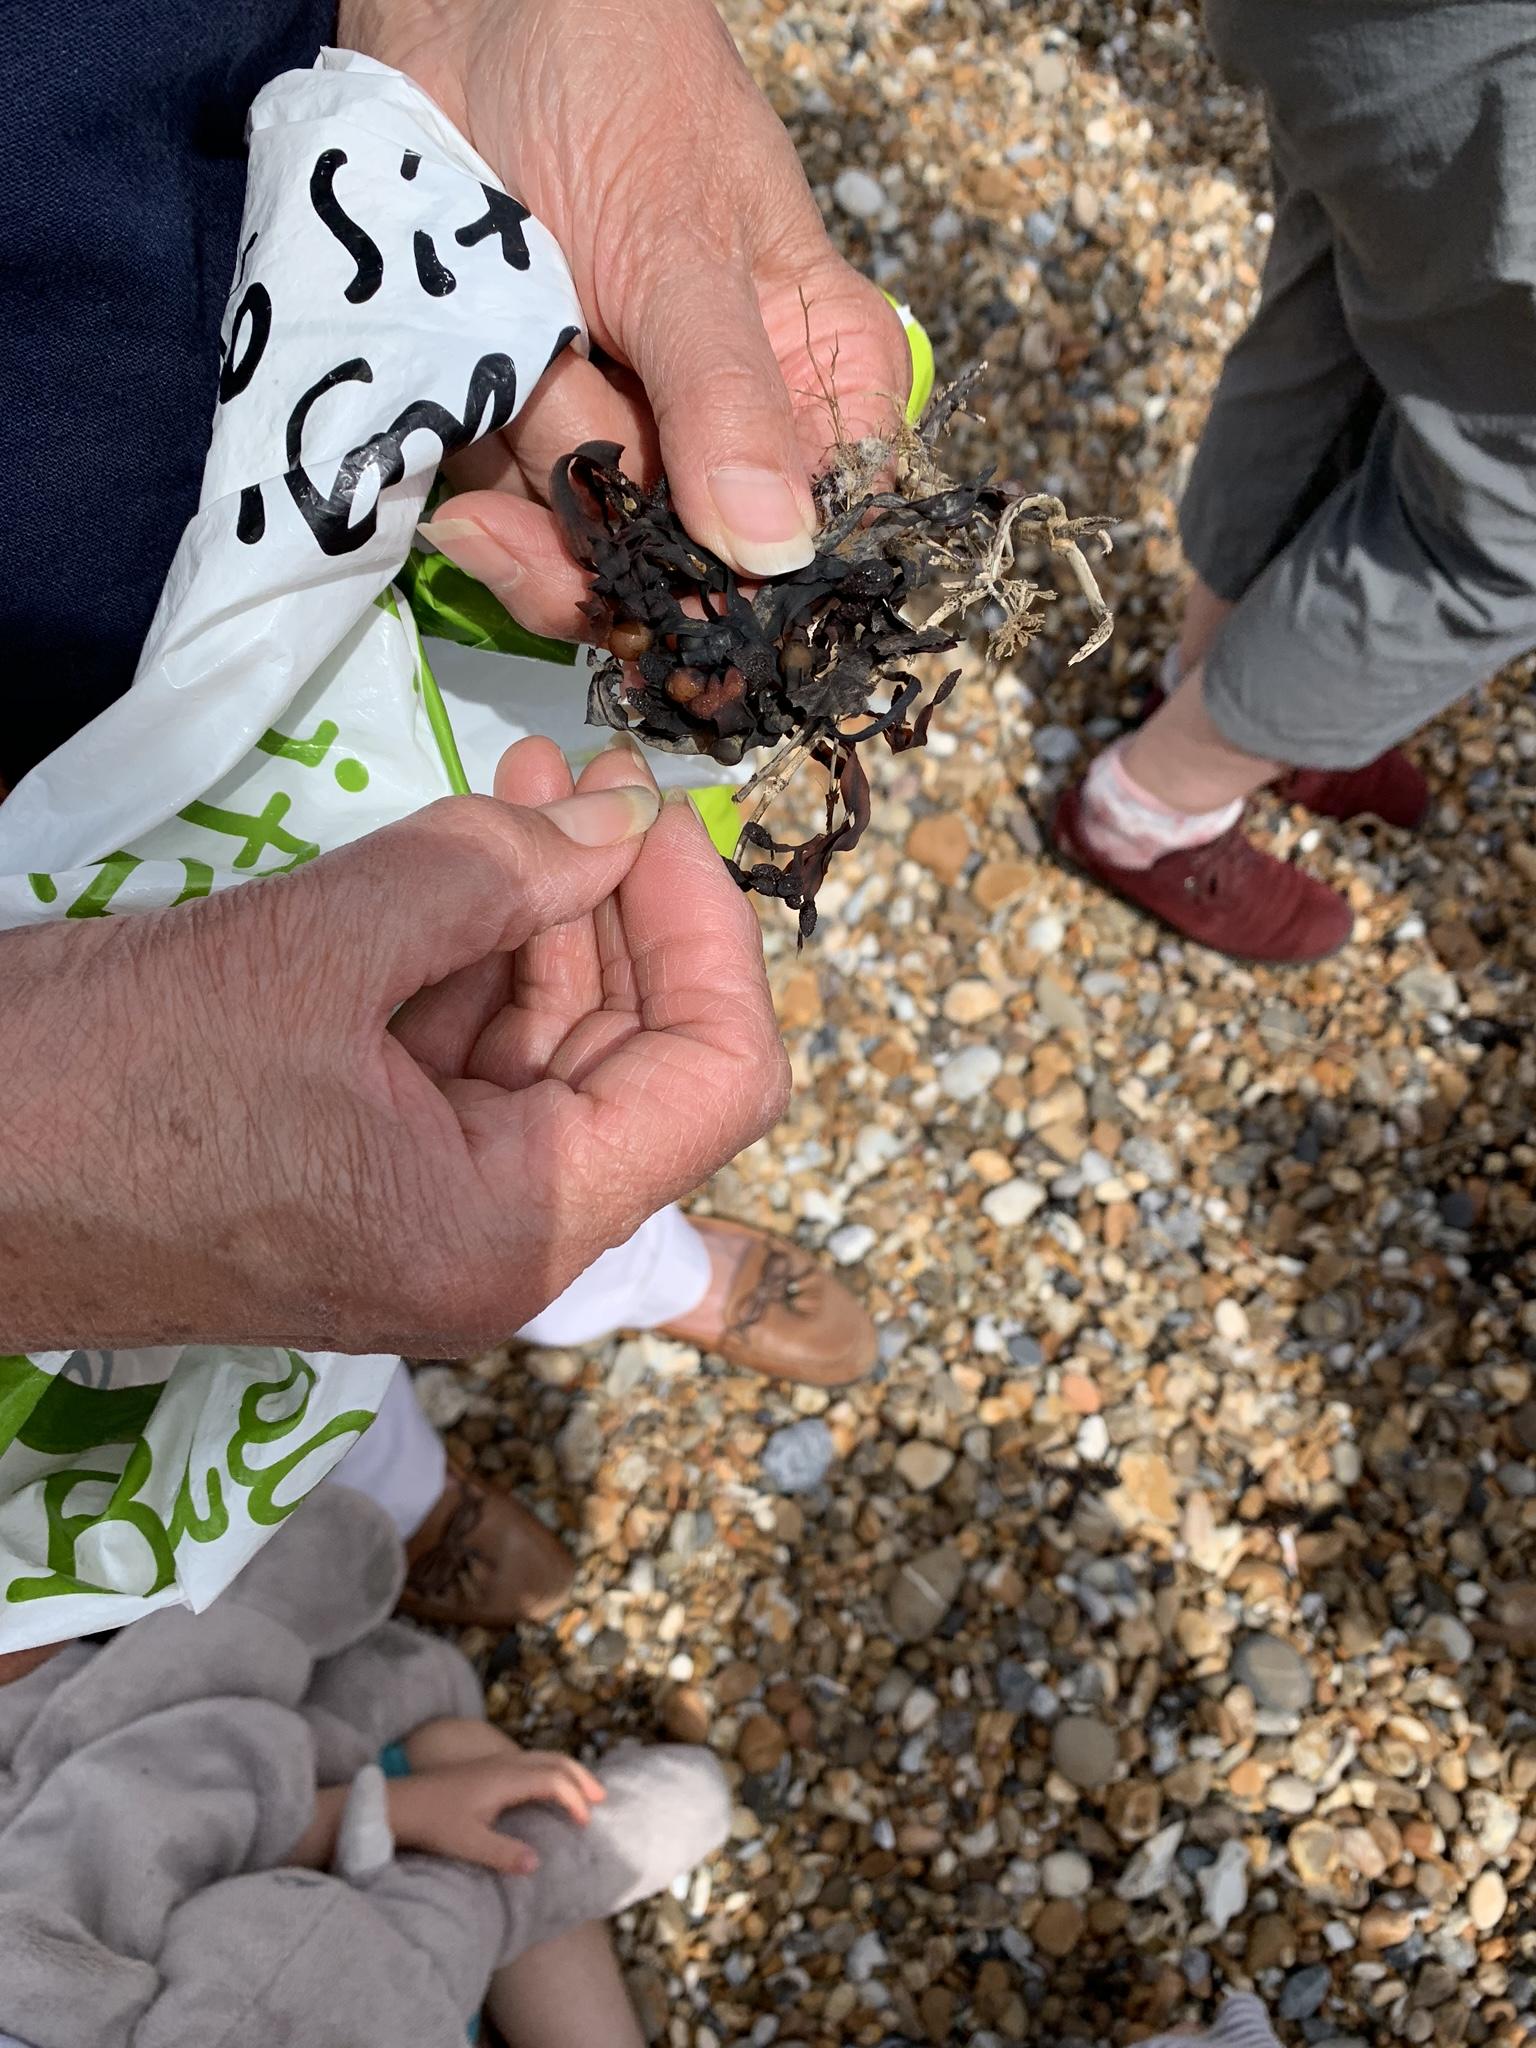 Beachcombing with kids, looking at seaweed